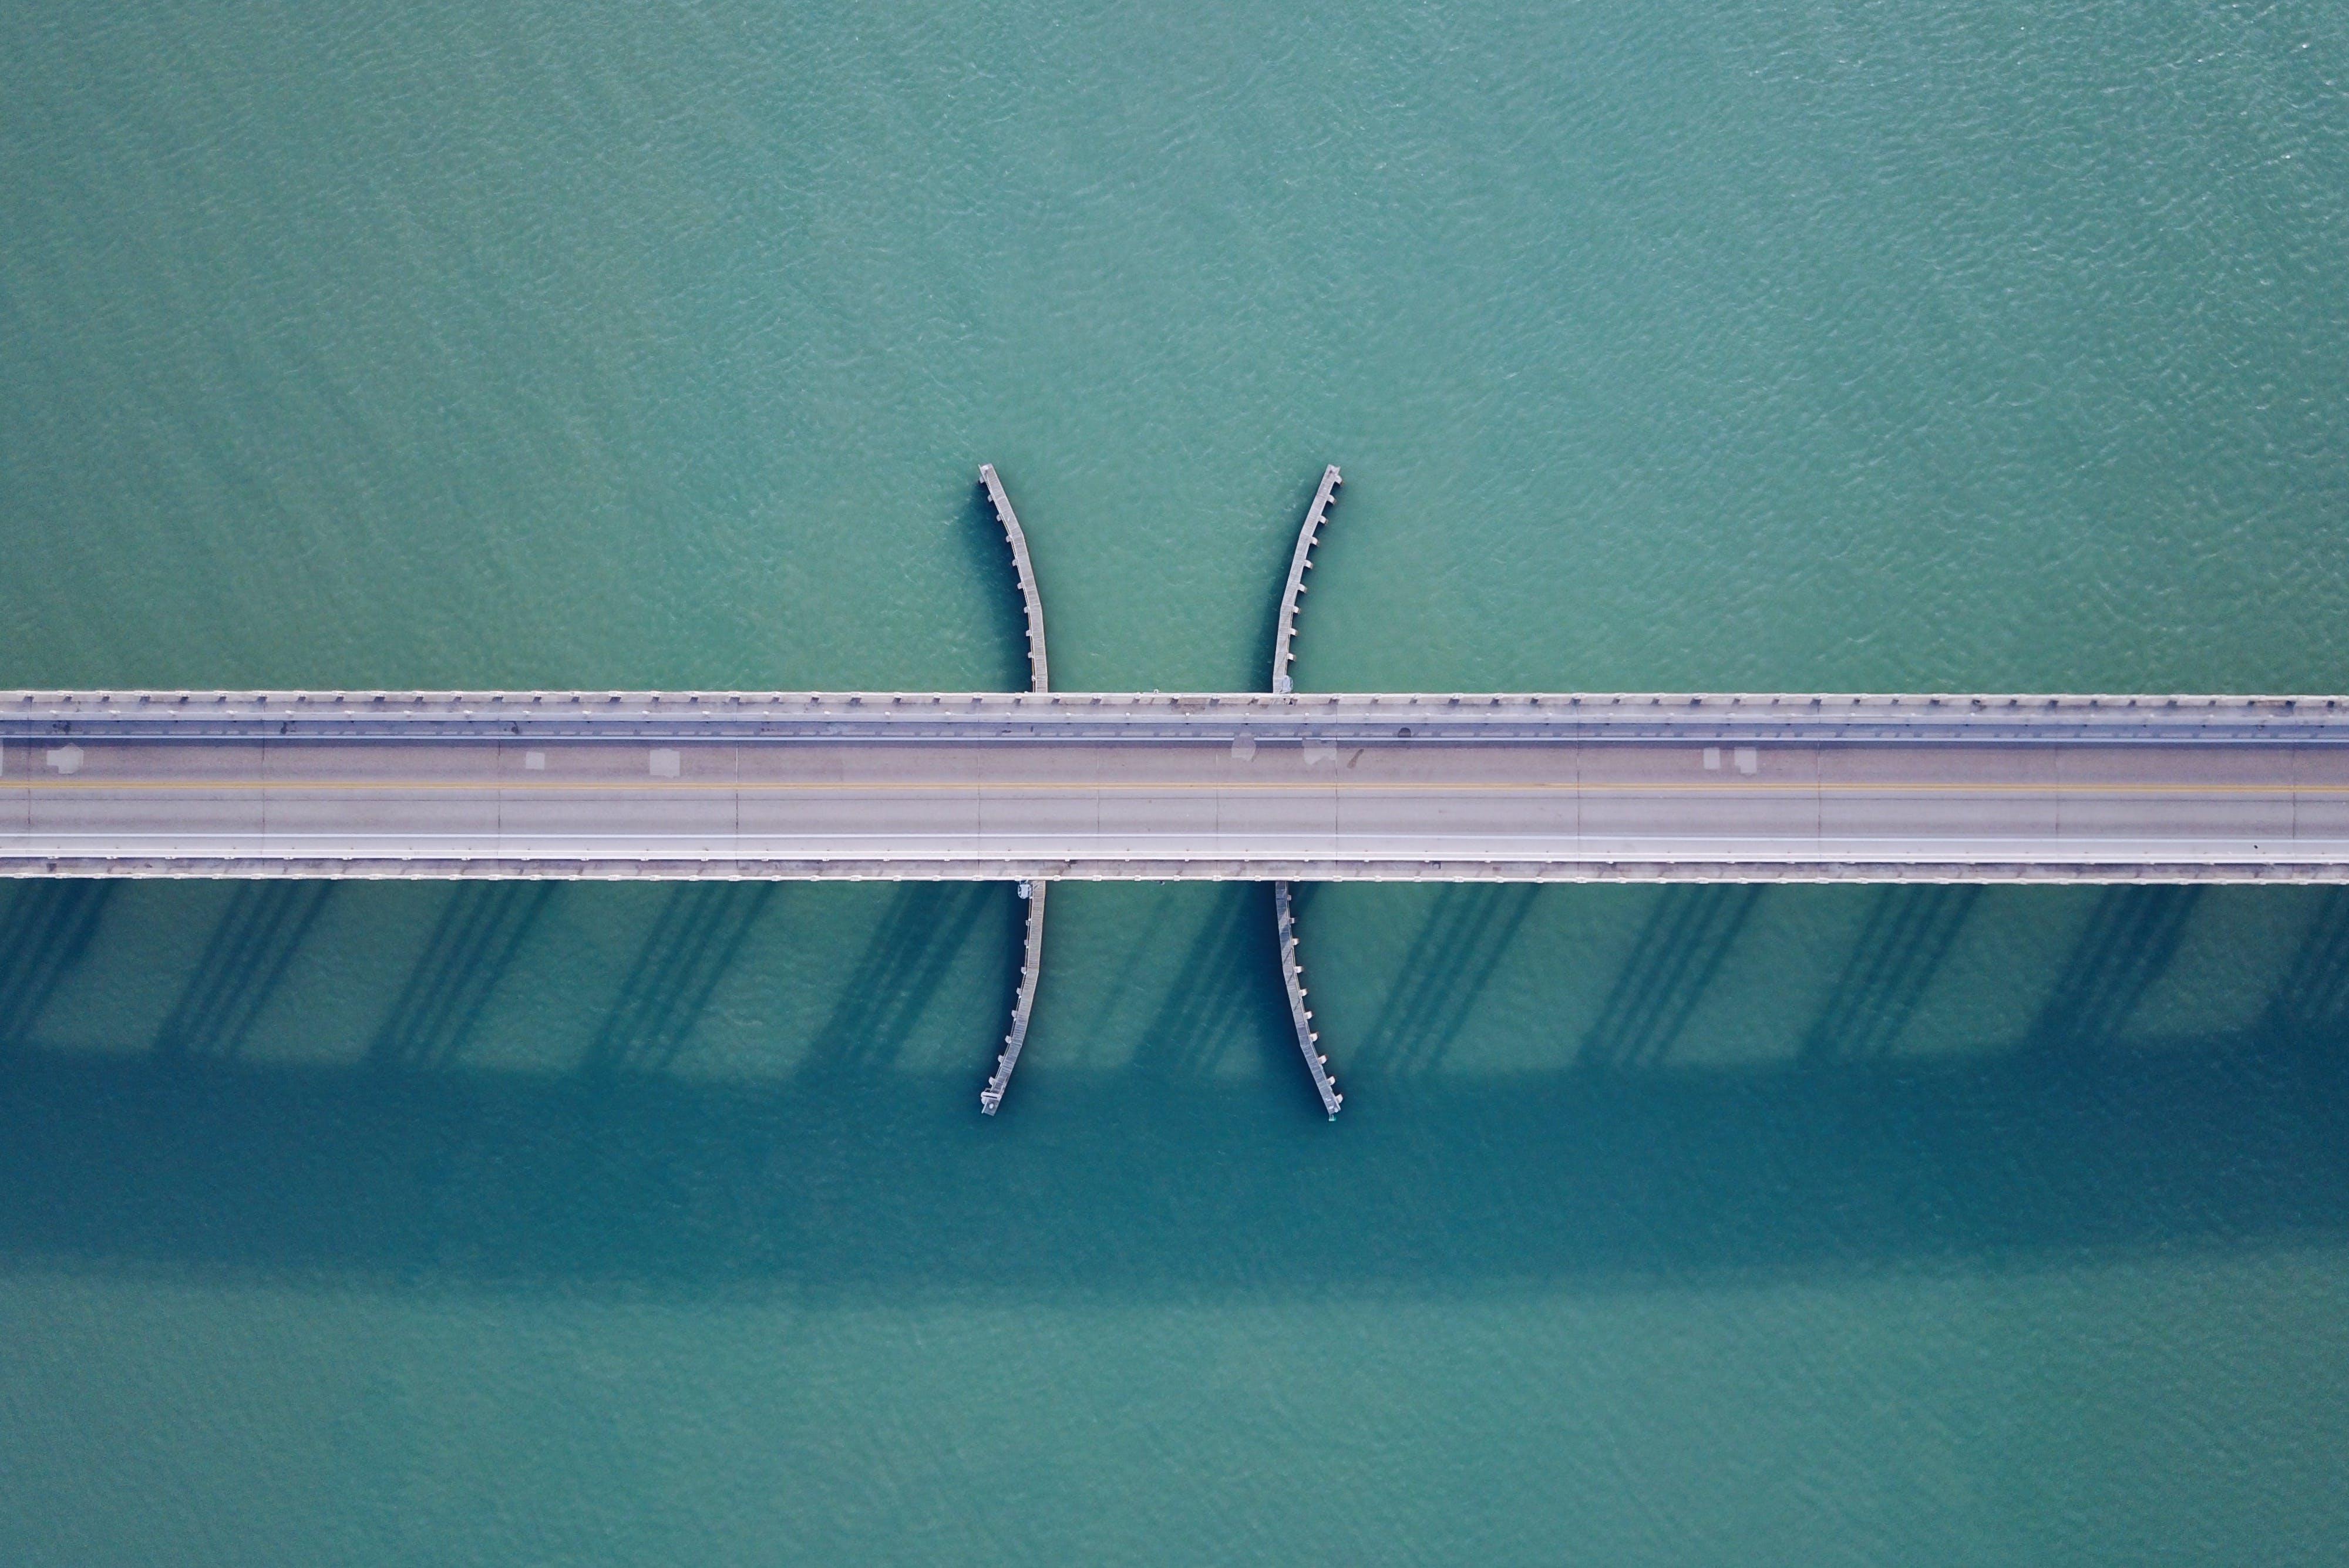 Grey Bridge Connection